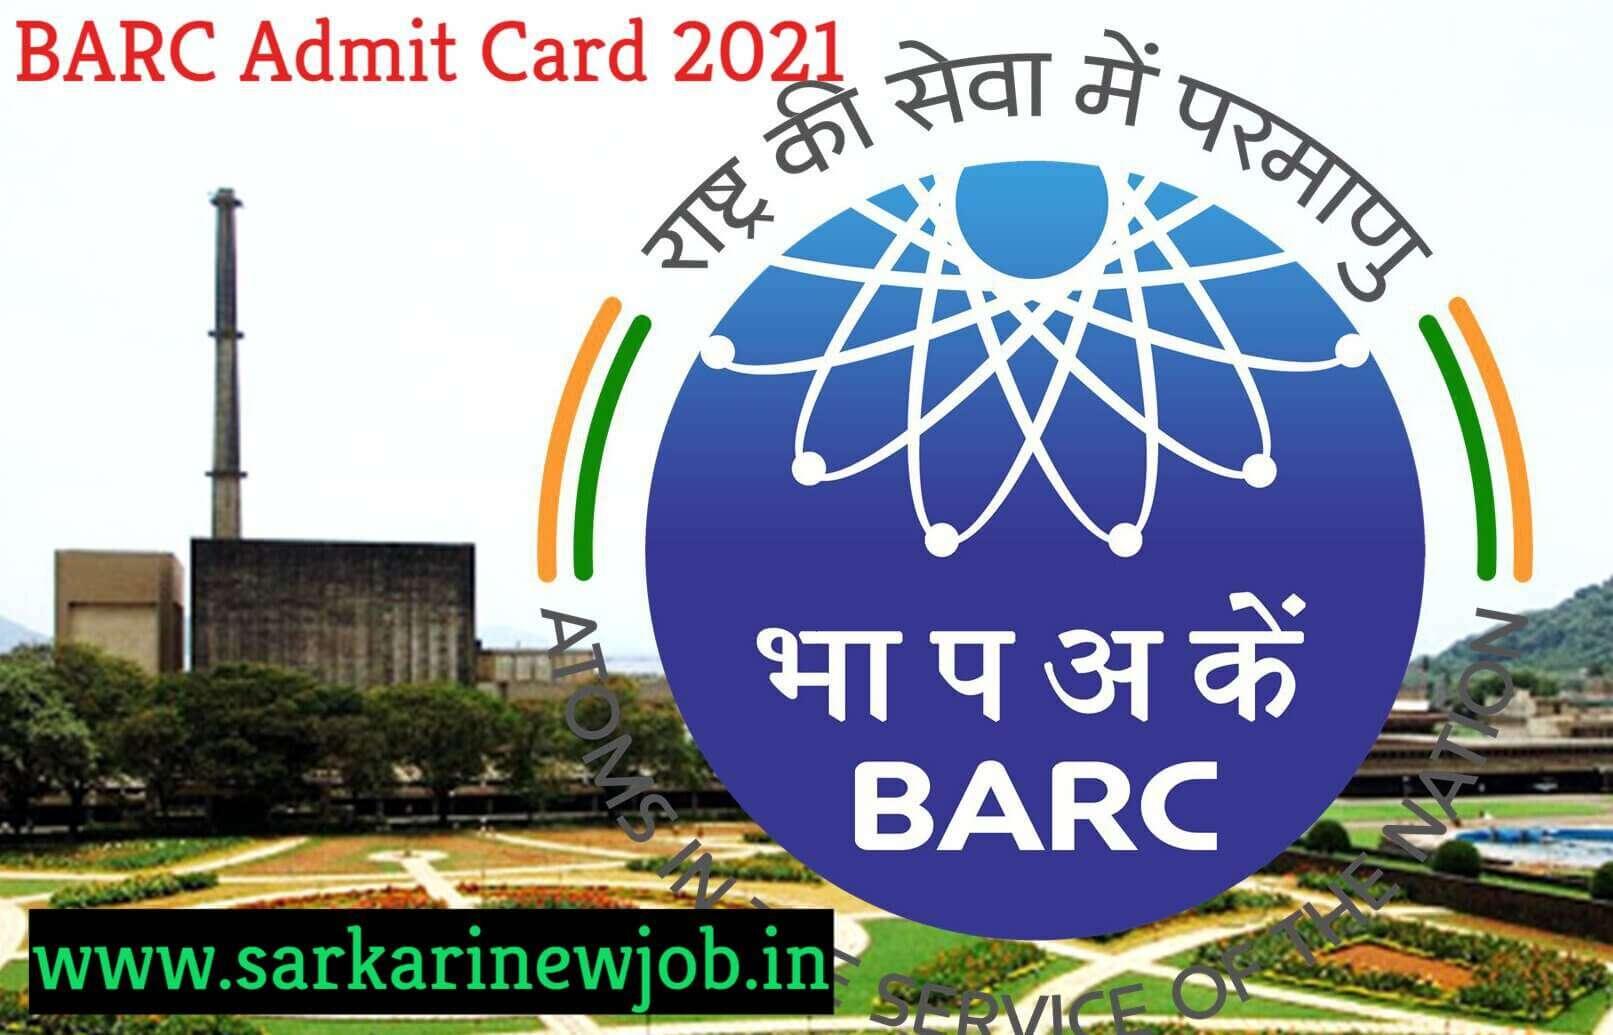 BARC Admit Card 2021 Kaise Dekhe  Login , Exam Full Information